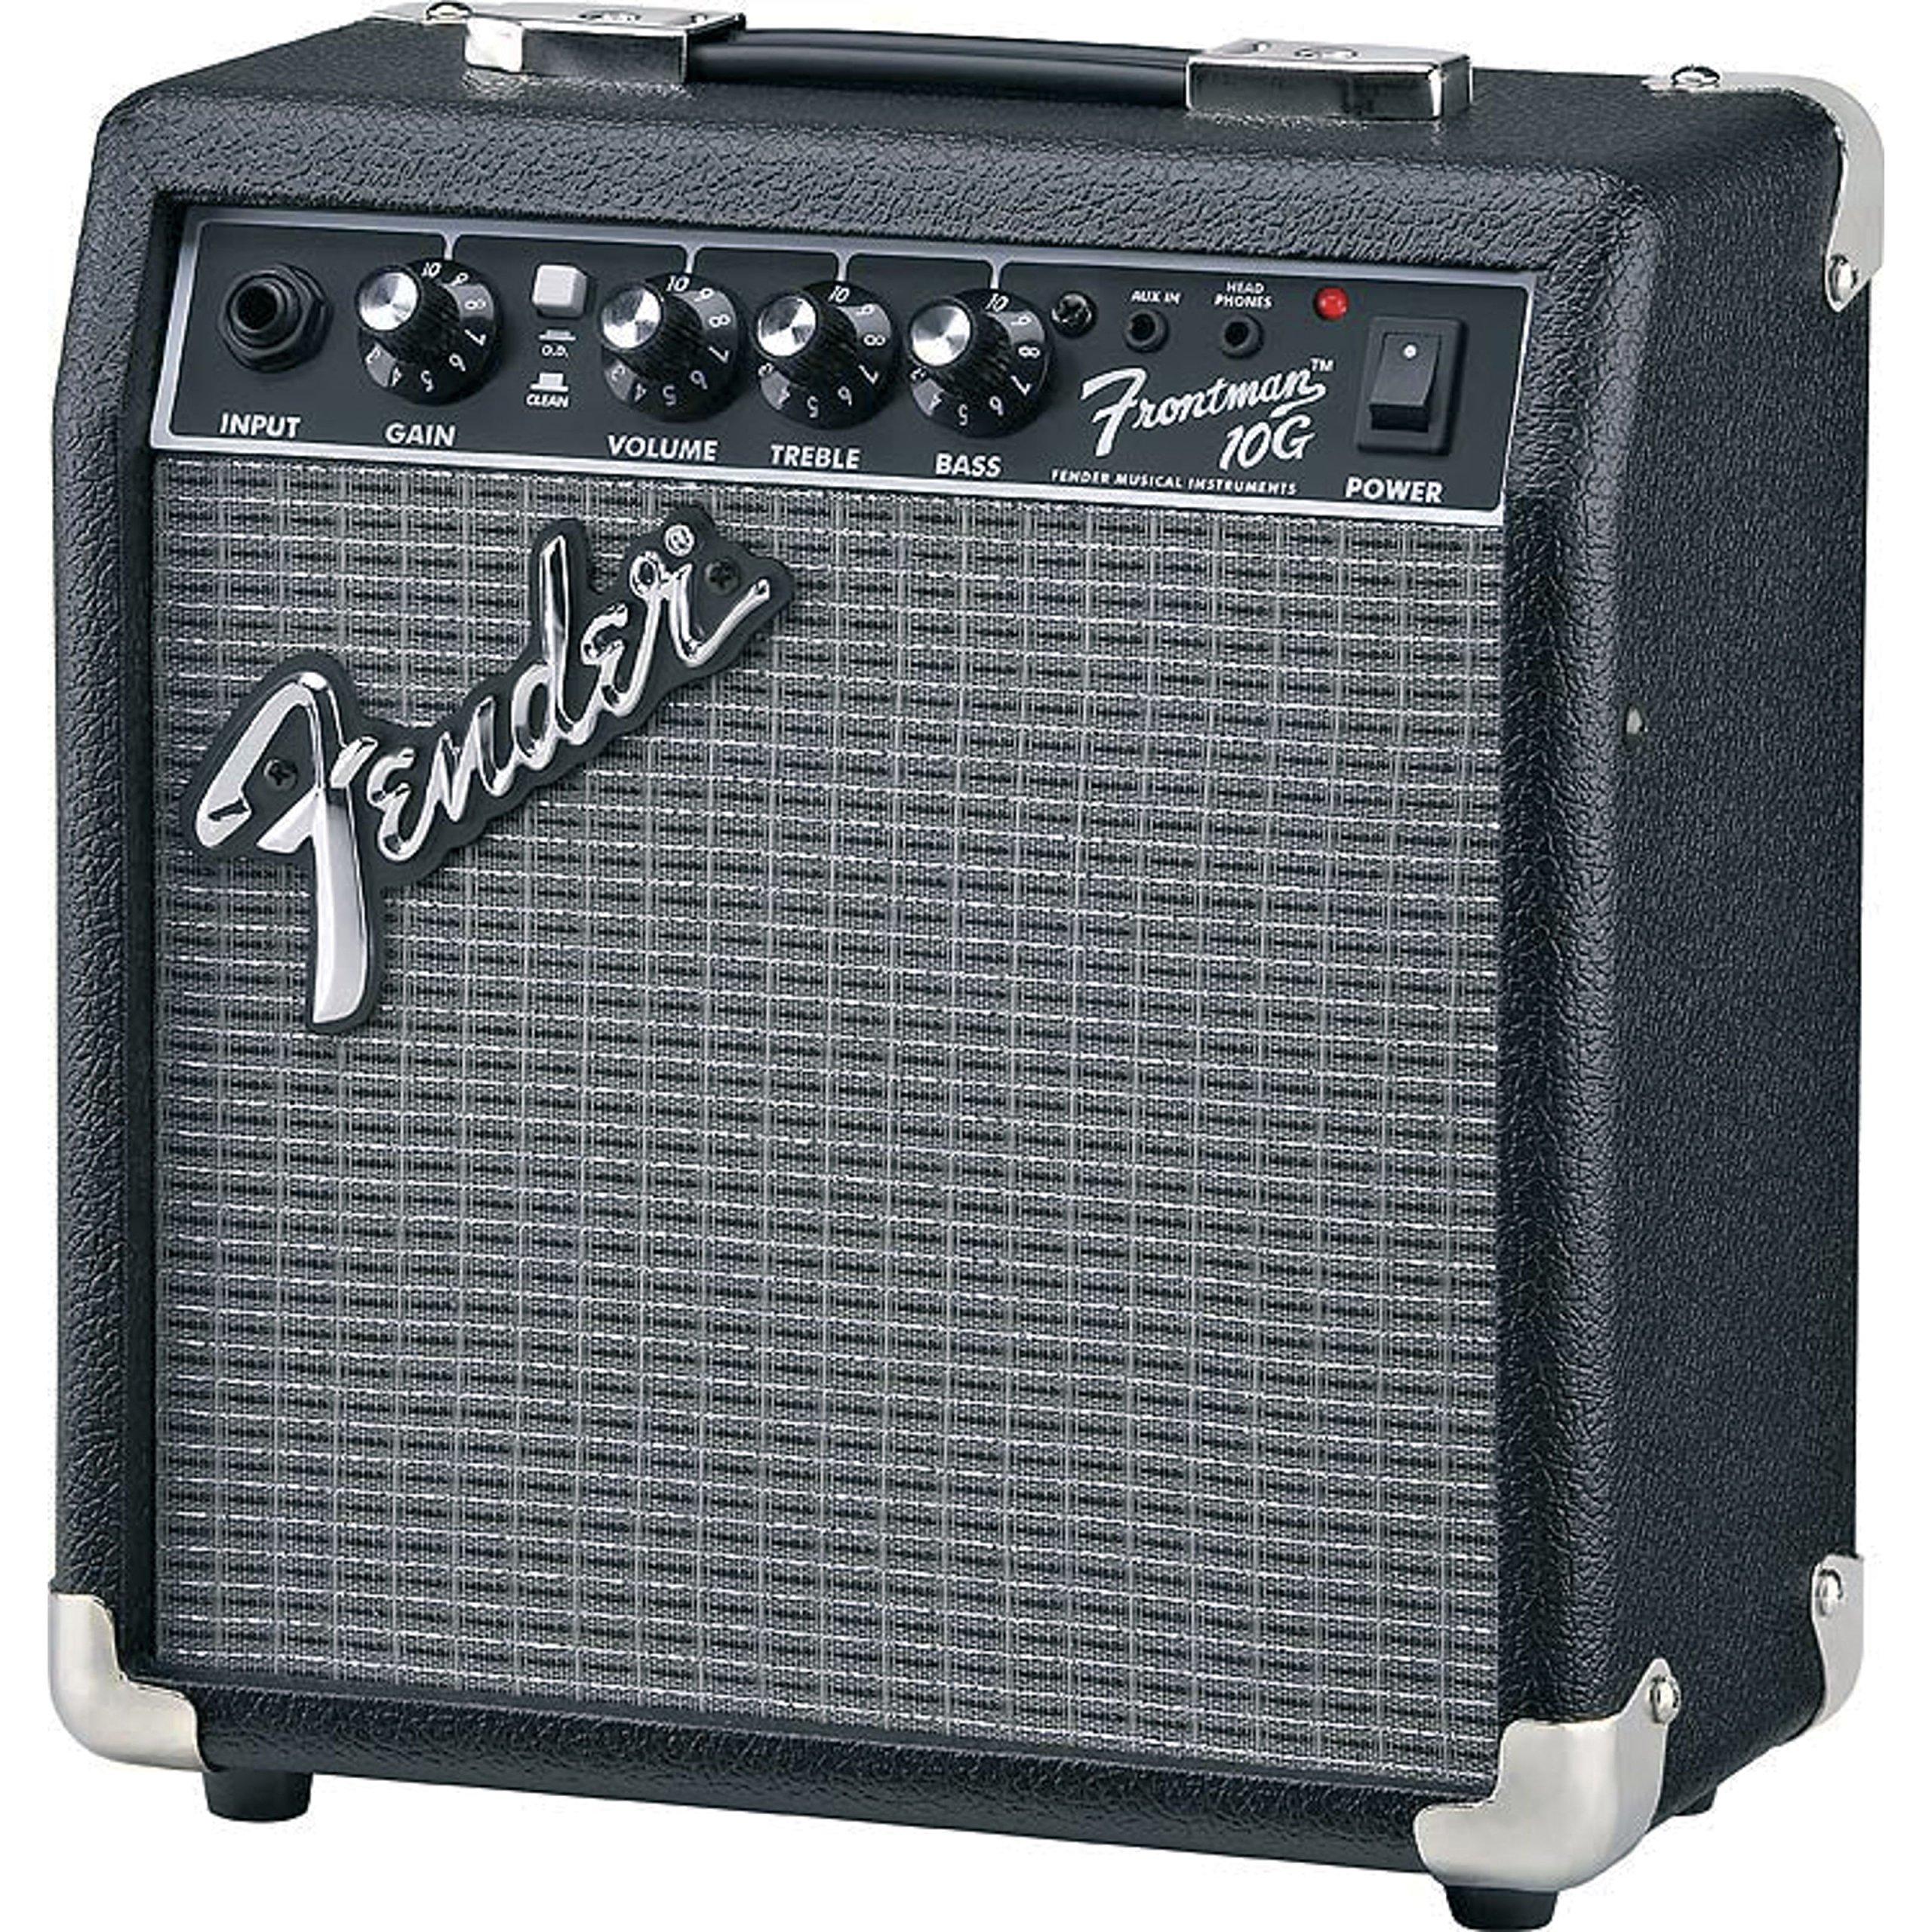 Fender Frontman - 10G Amplificador para guitarra, 230 V EUR product image